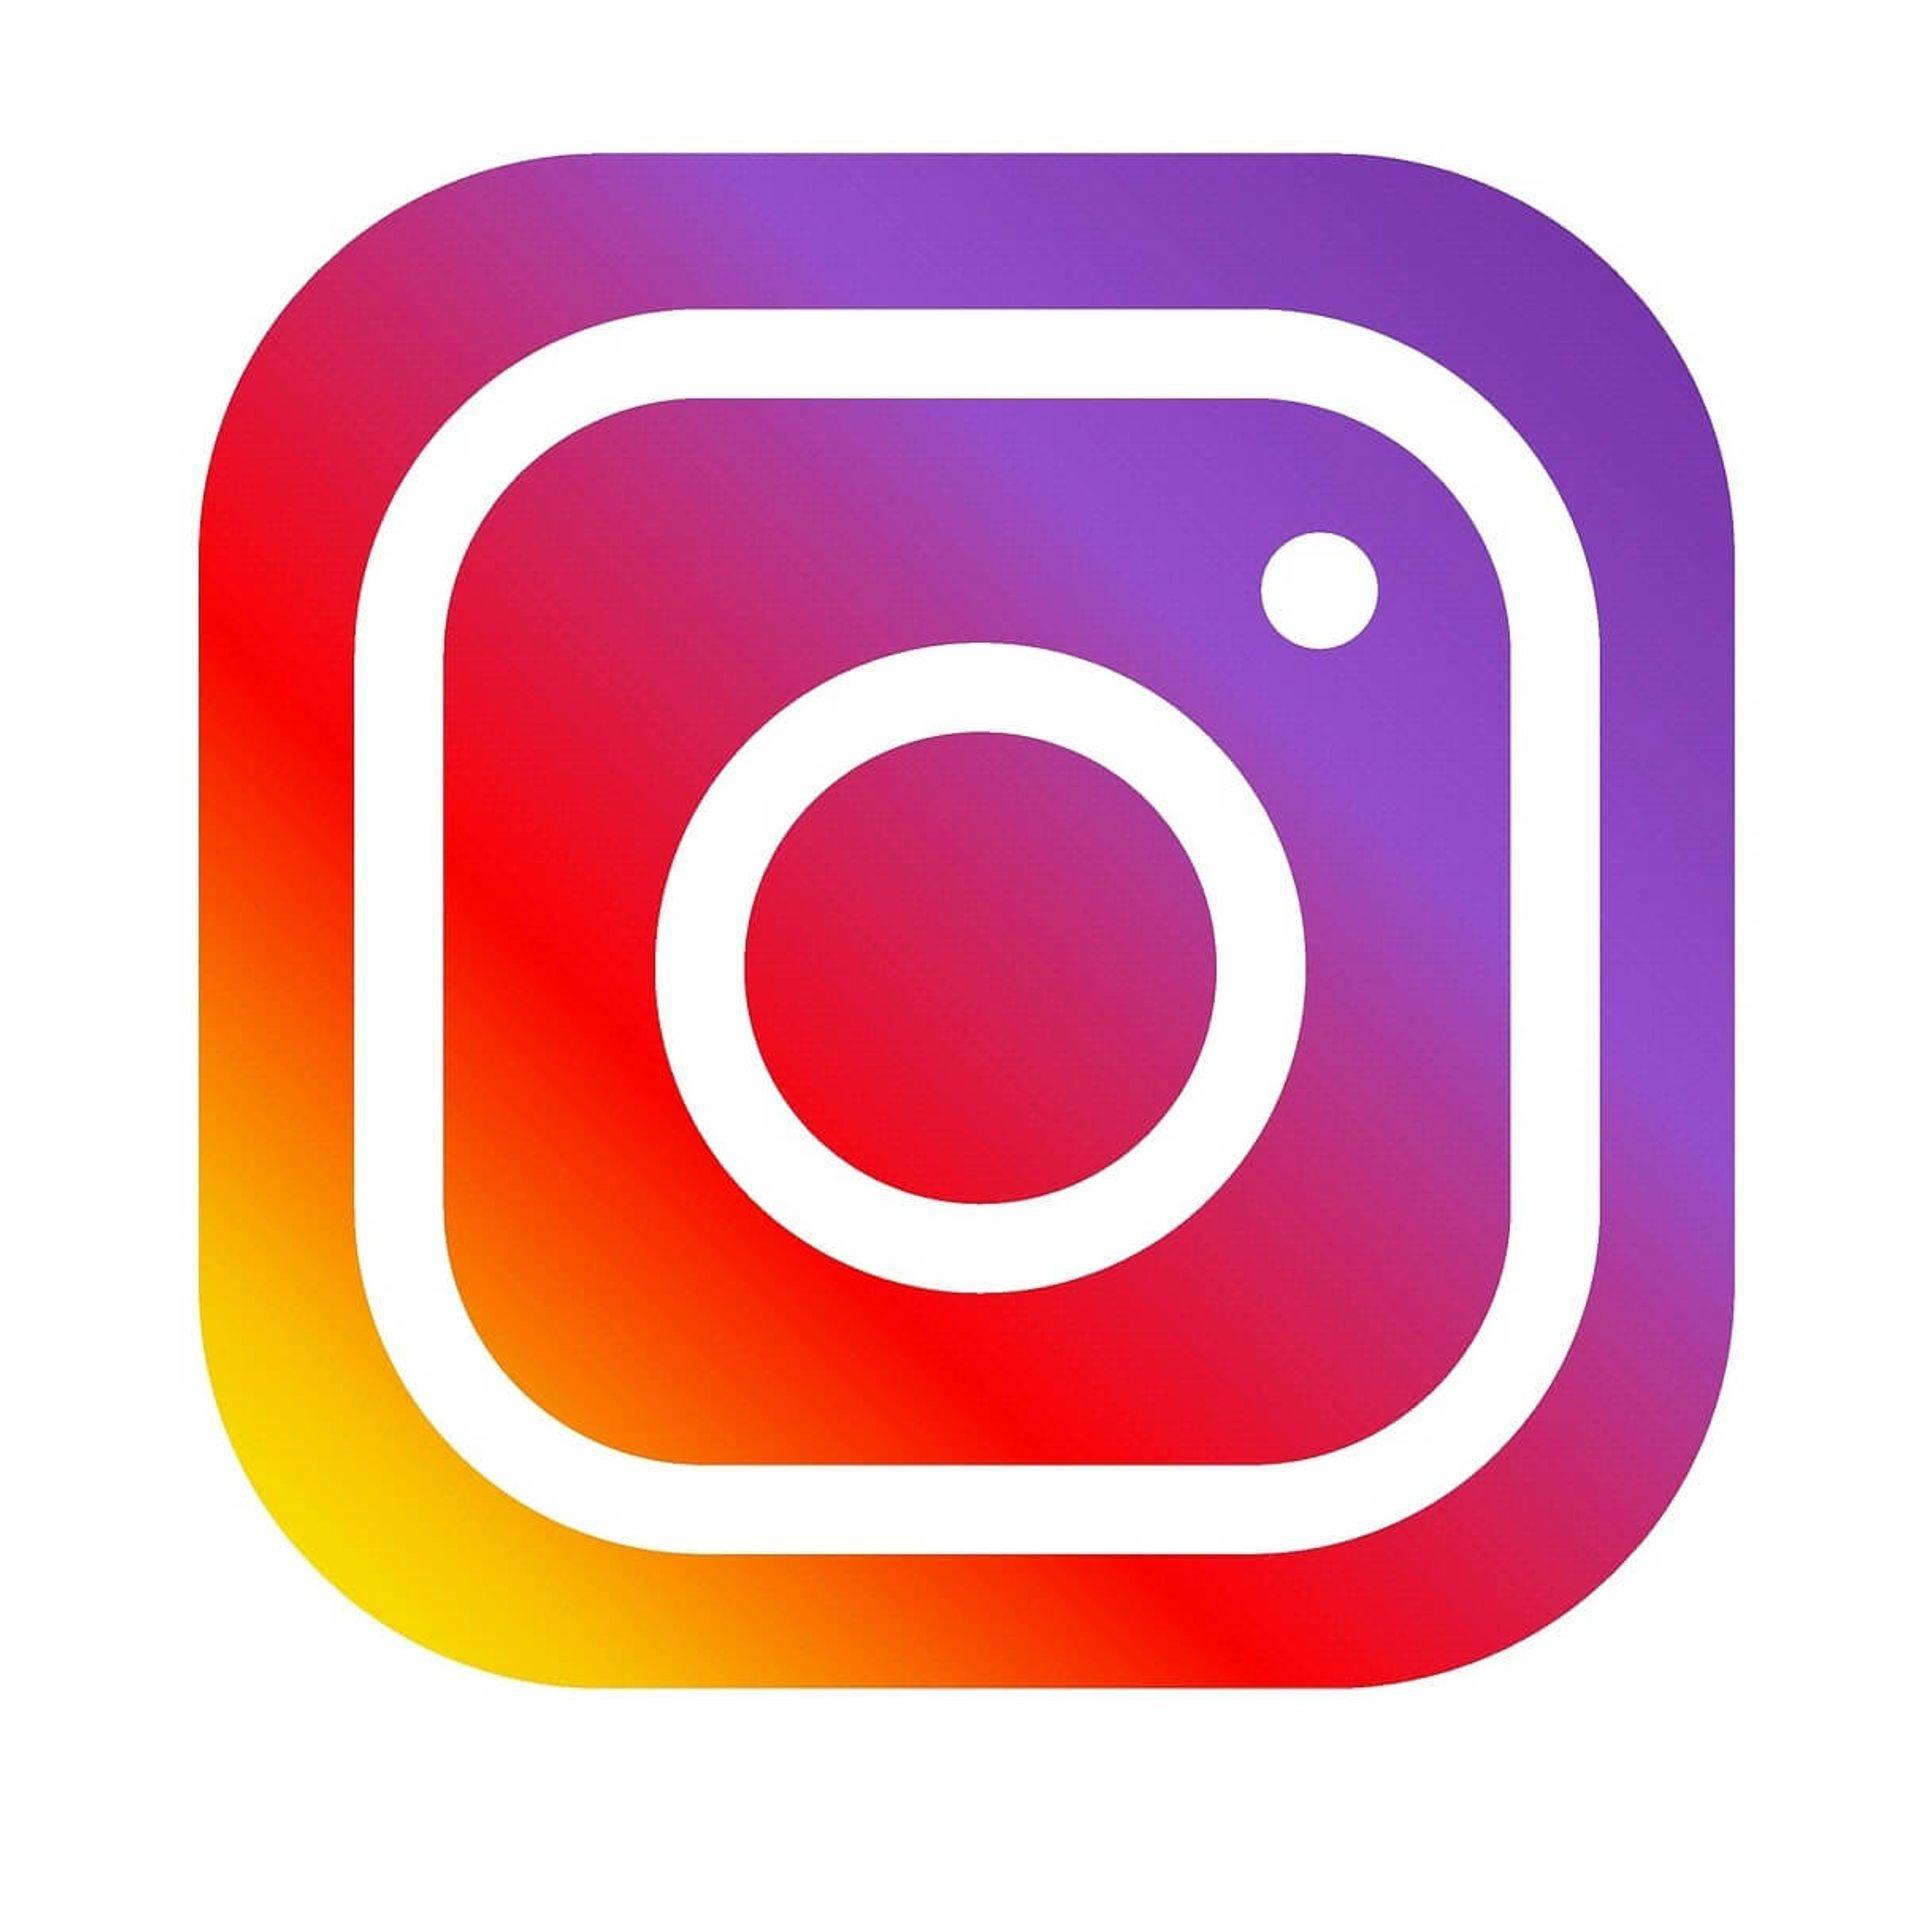 Grygla Seed Instagram Logo